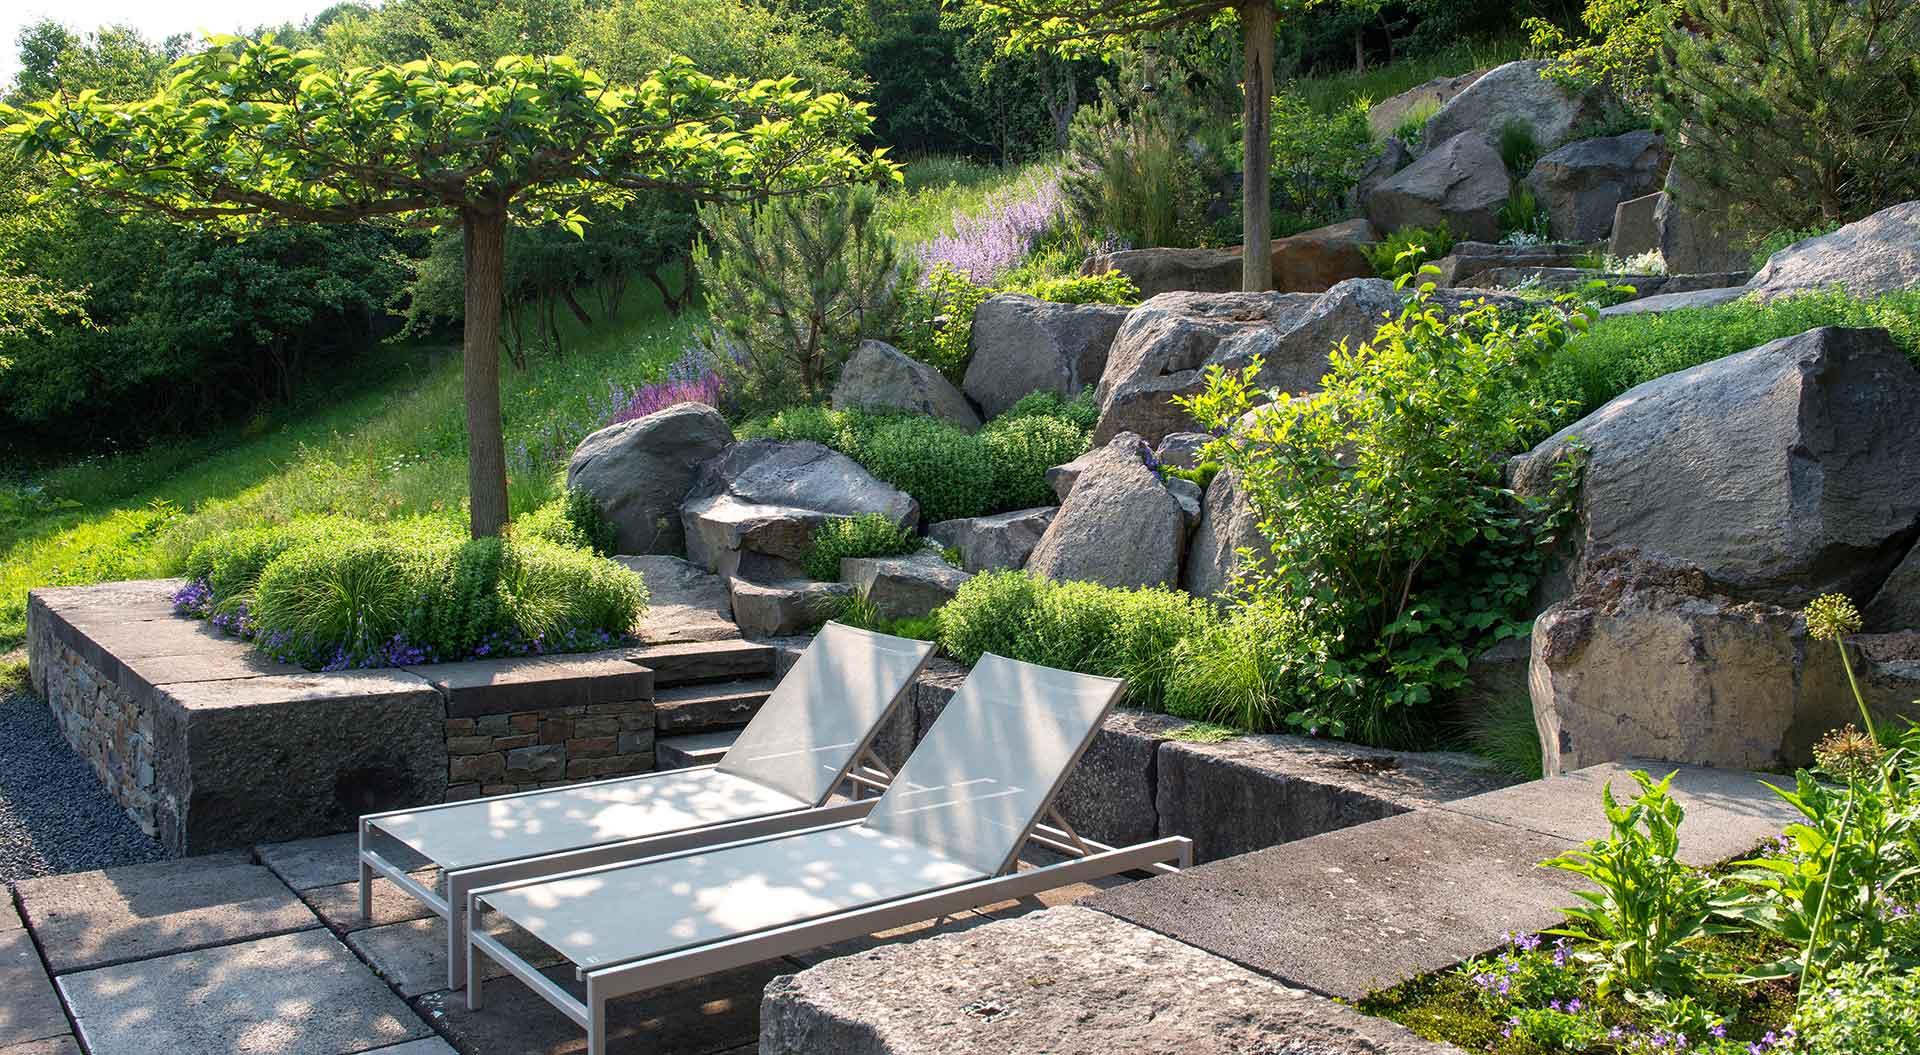 Liegeplätze im steinigen sowie grünen Hanggarten